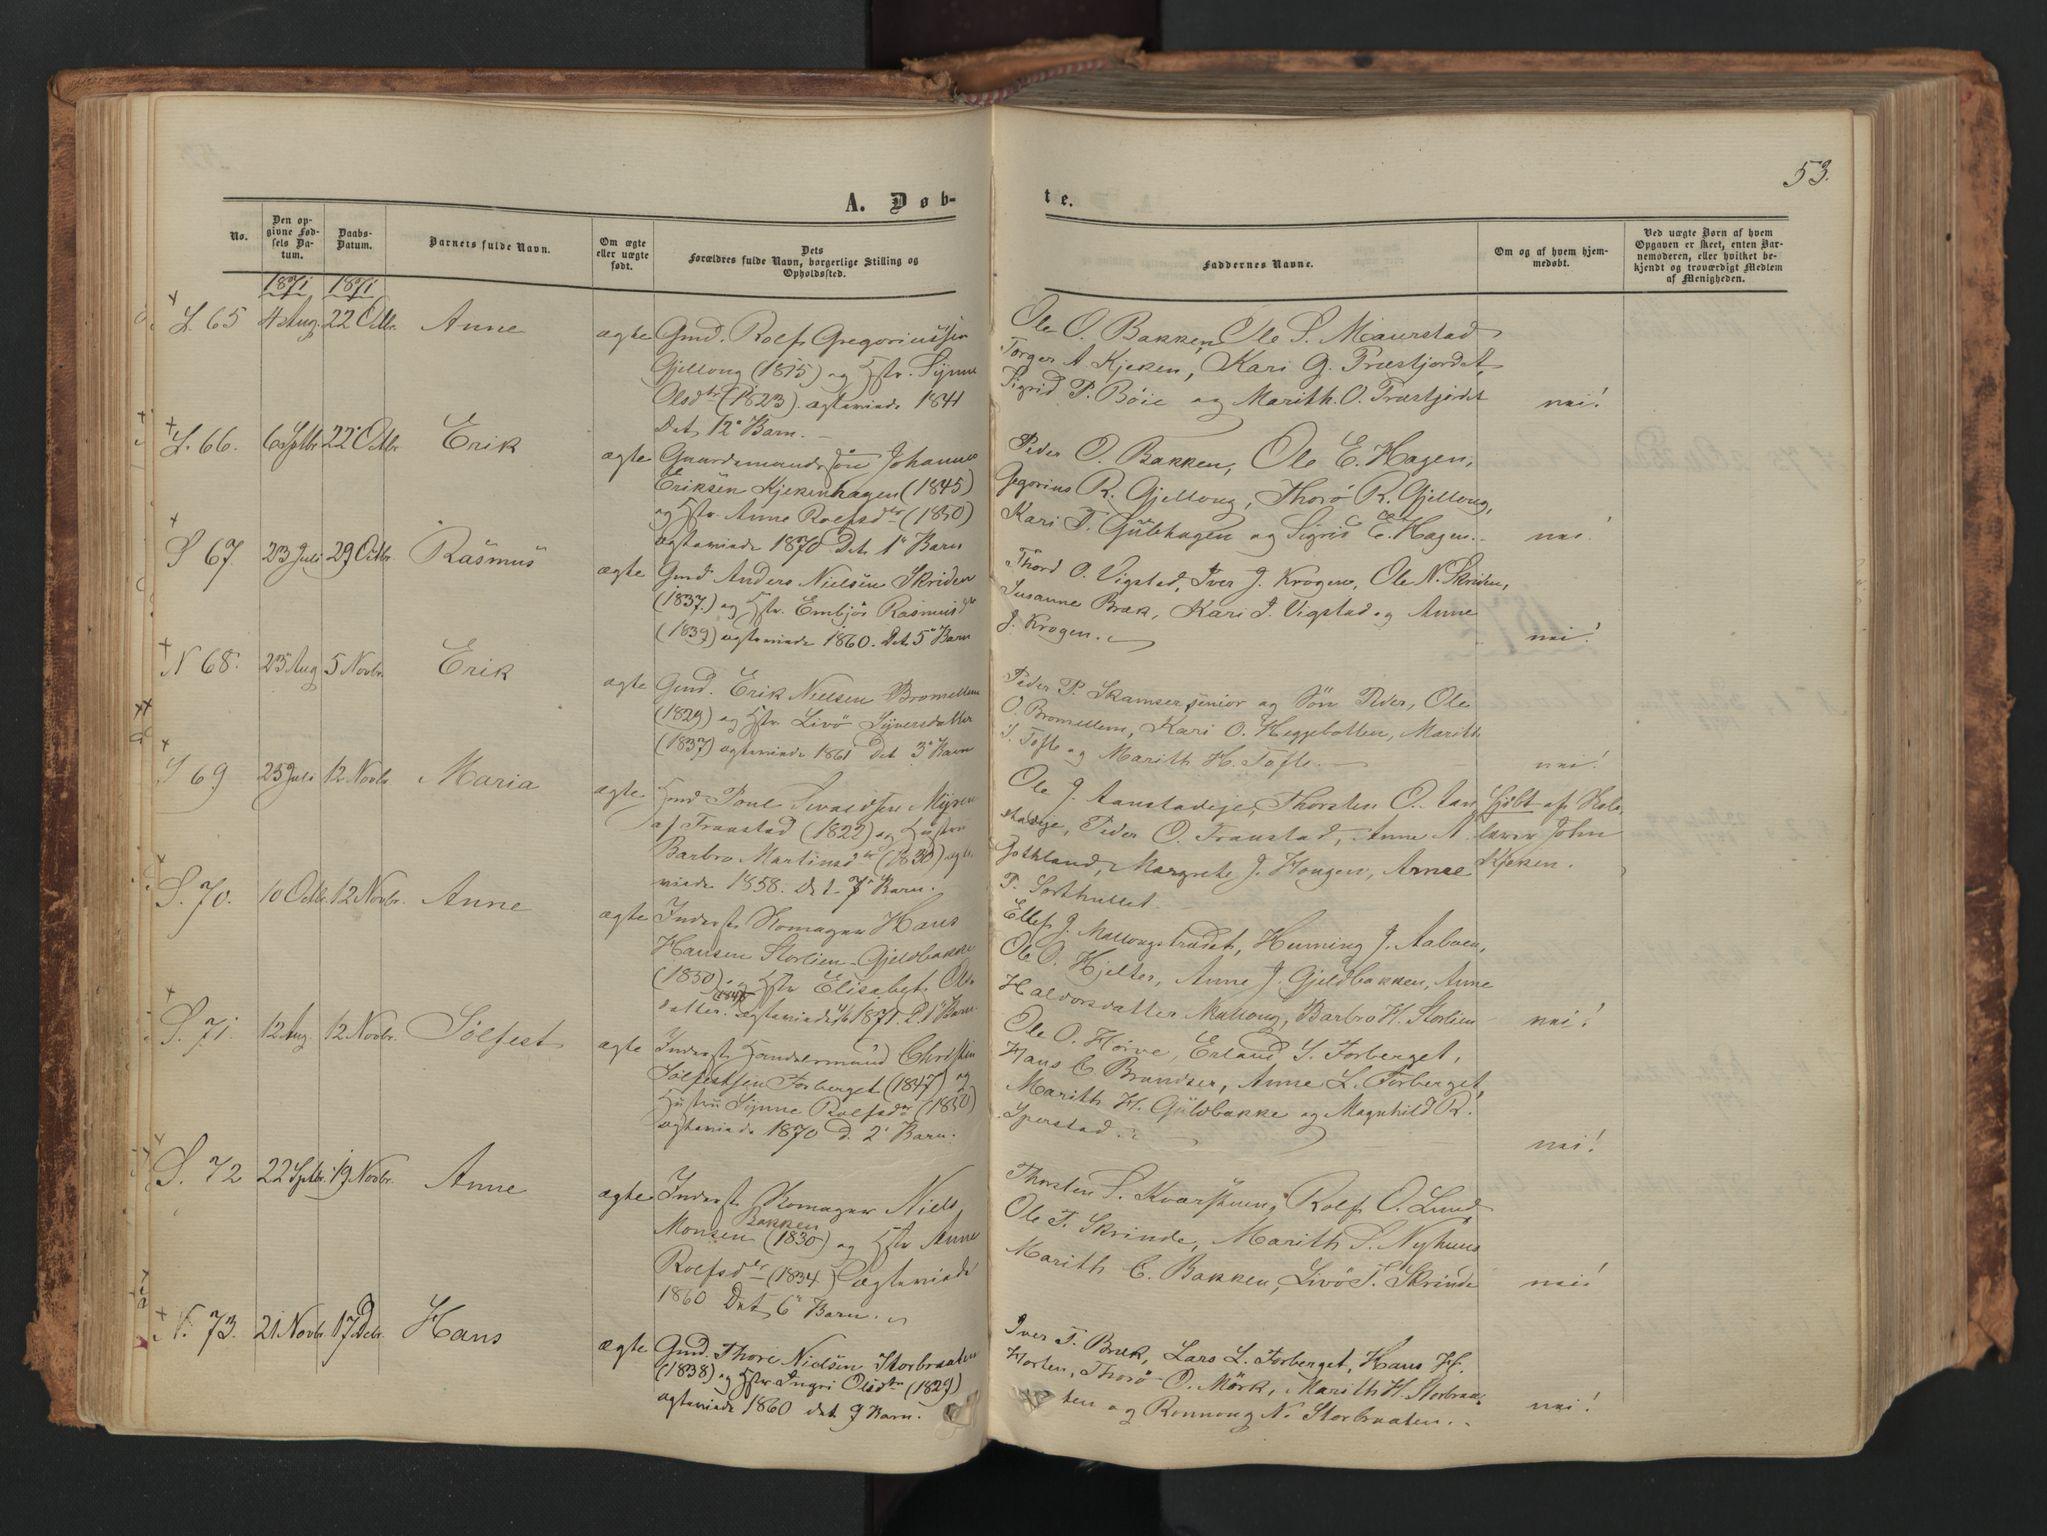 SAH, Skjåk prestekontor, Ministerialbok nr. 1, 1863-1879, s. 53